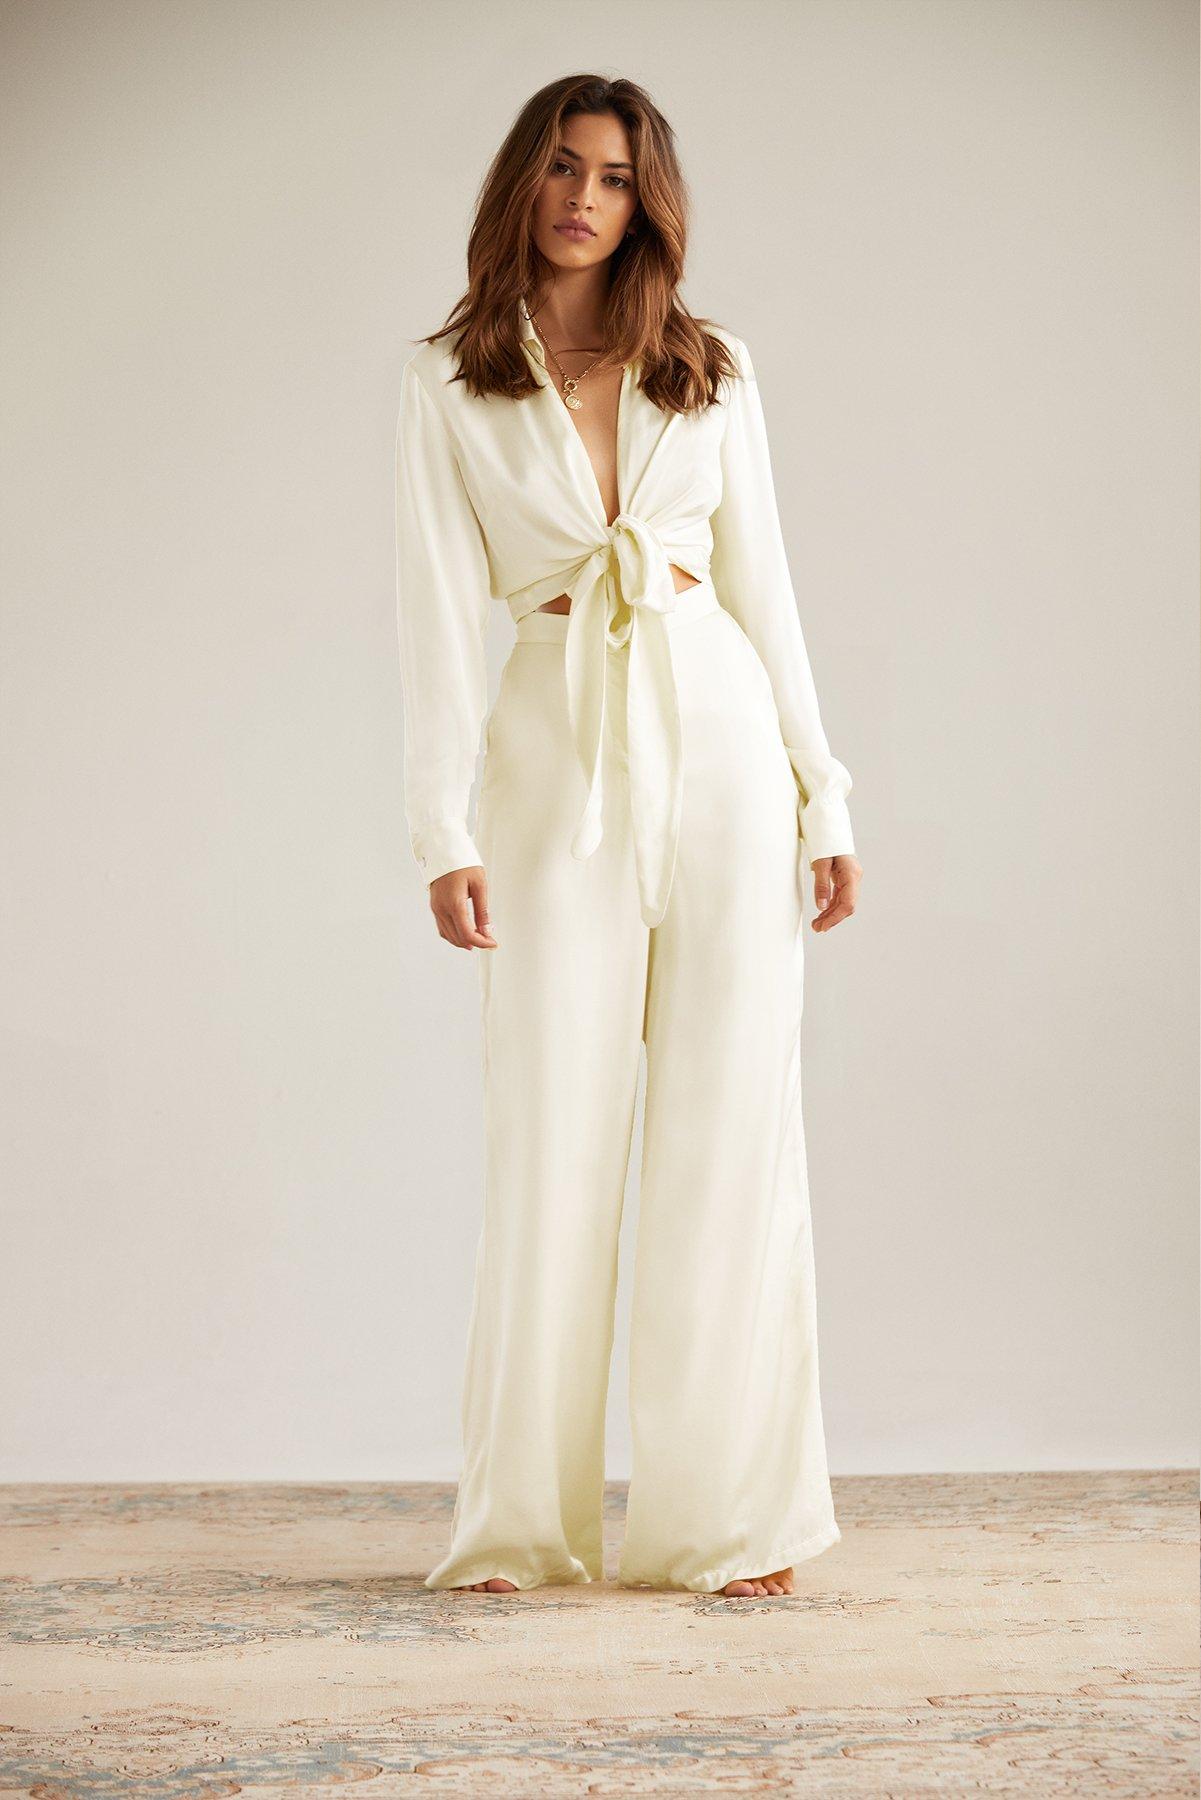 Bella Satin Pant in Ecru by Andjela, available on andjelacollection.com for $178 Natasha Oakley Pants Exact Product